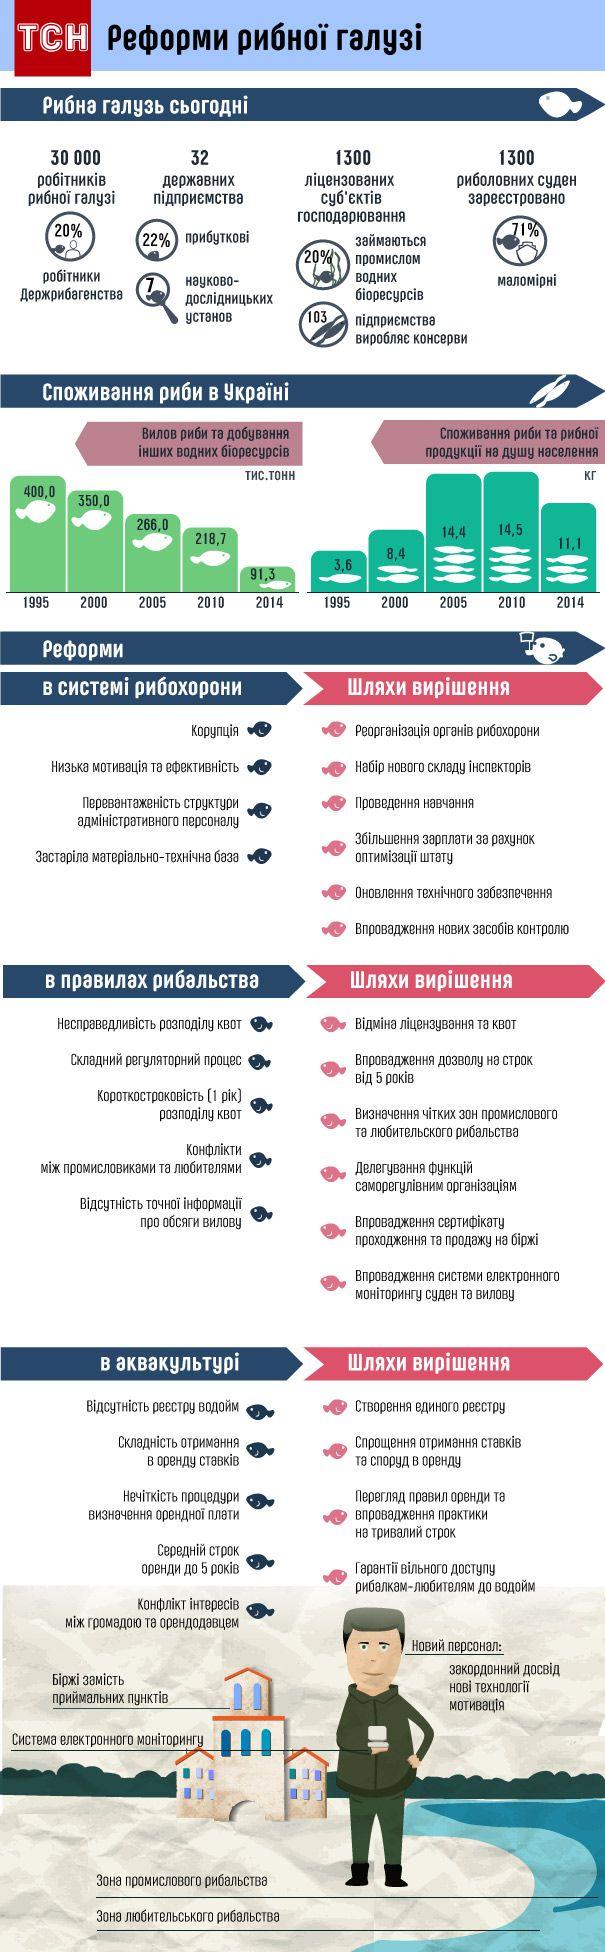 рыбный патруль / ru.tsn.ua